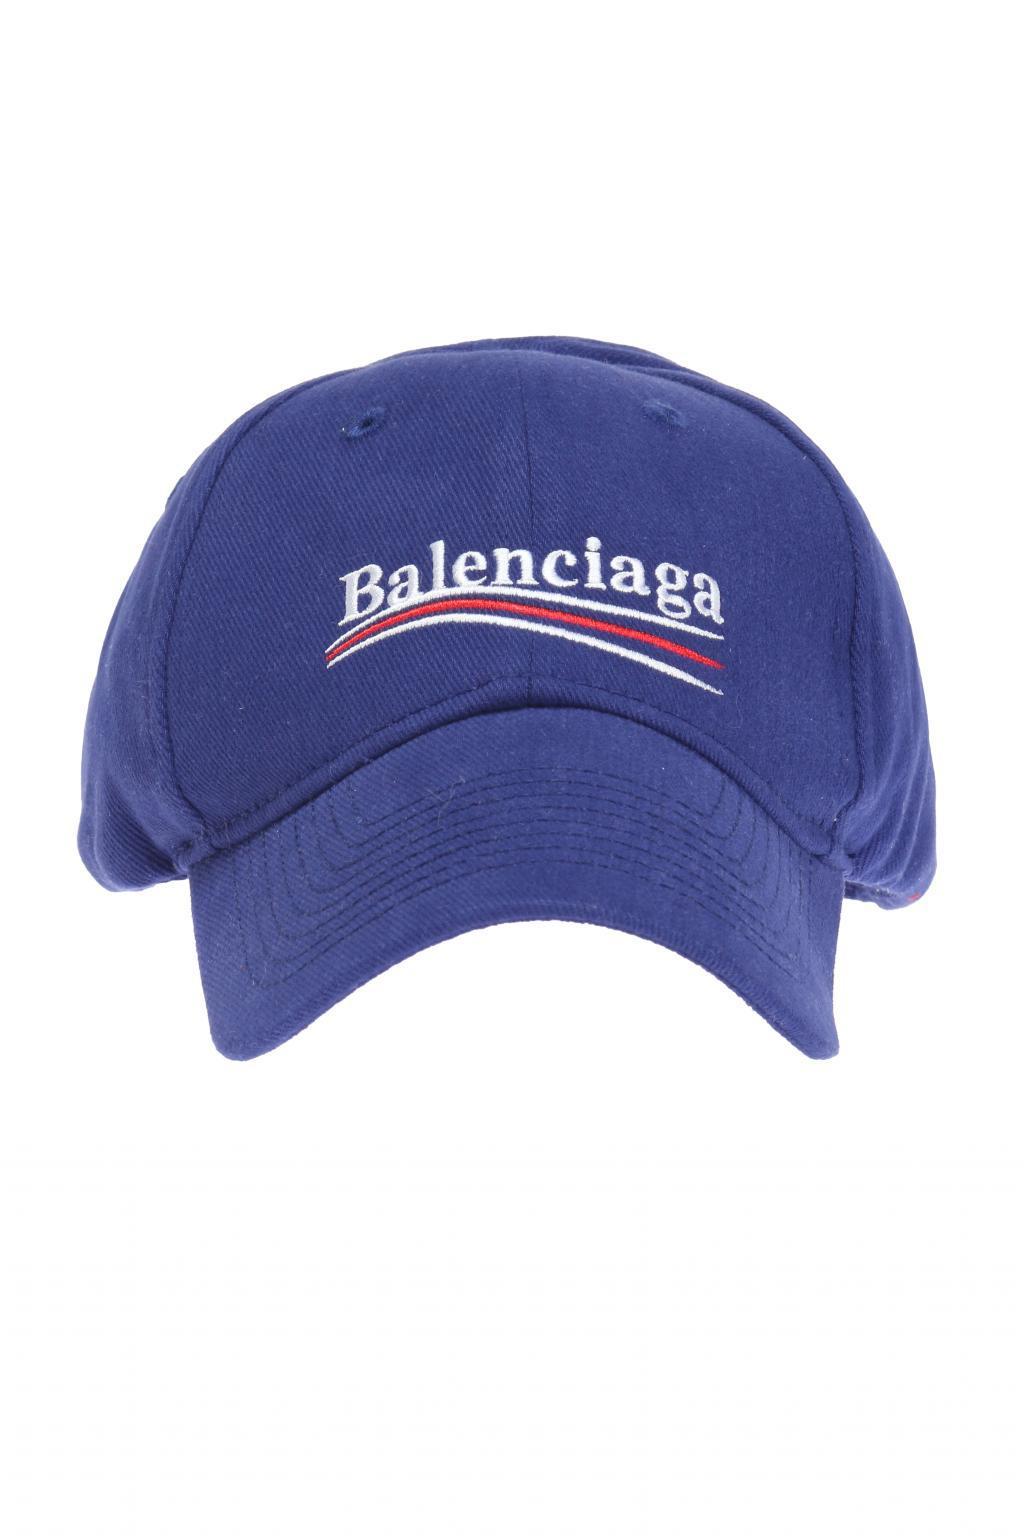 80e0577d48f Balenciaga - Blue Logo-embroidered Baseball Cap for Men - Lyst. View  fullscreen